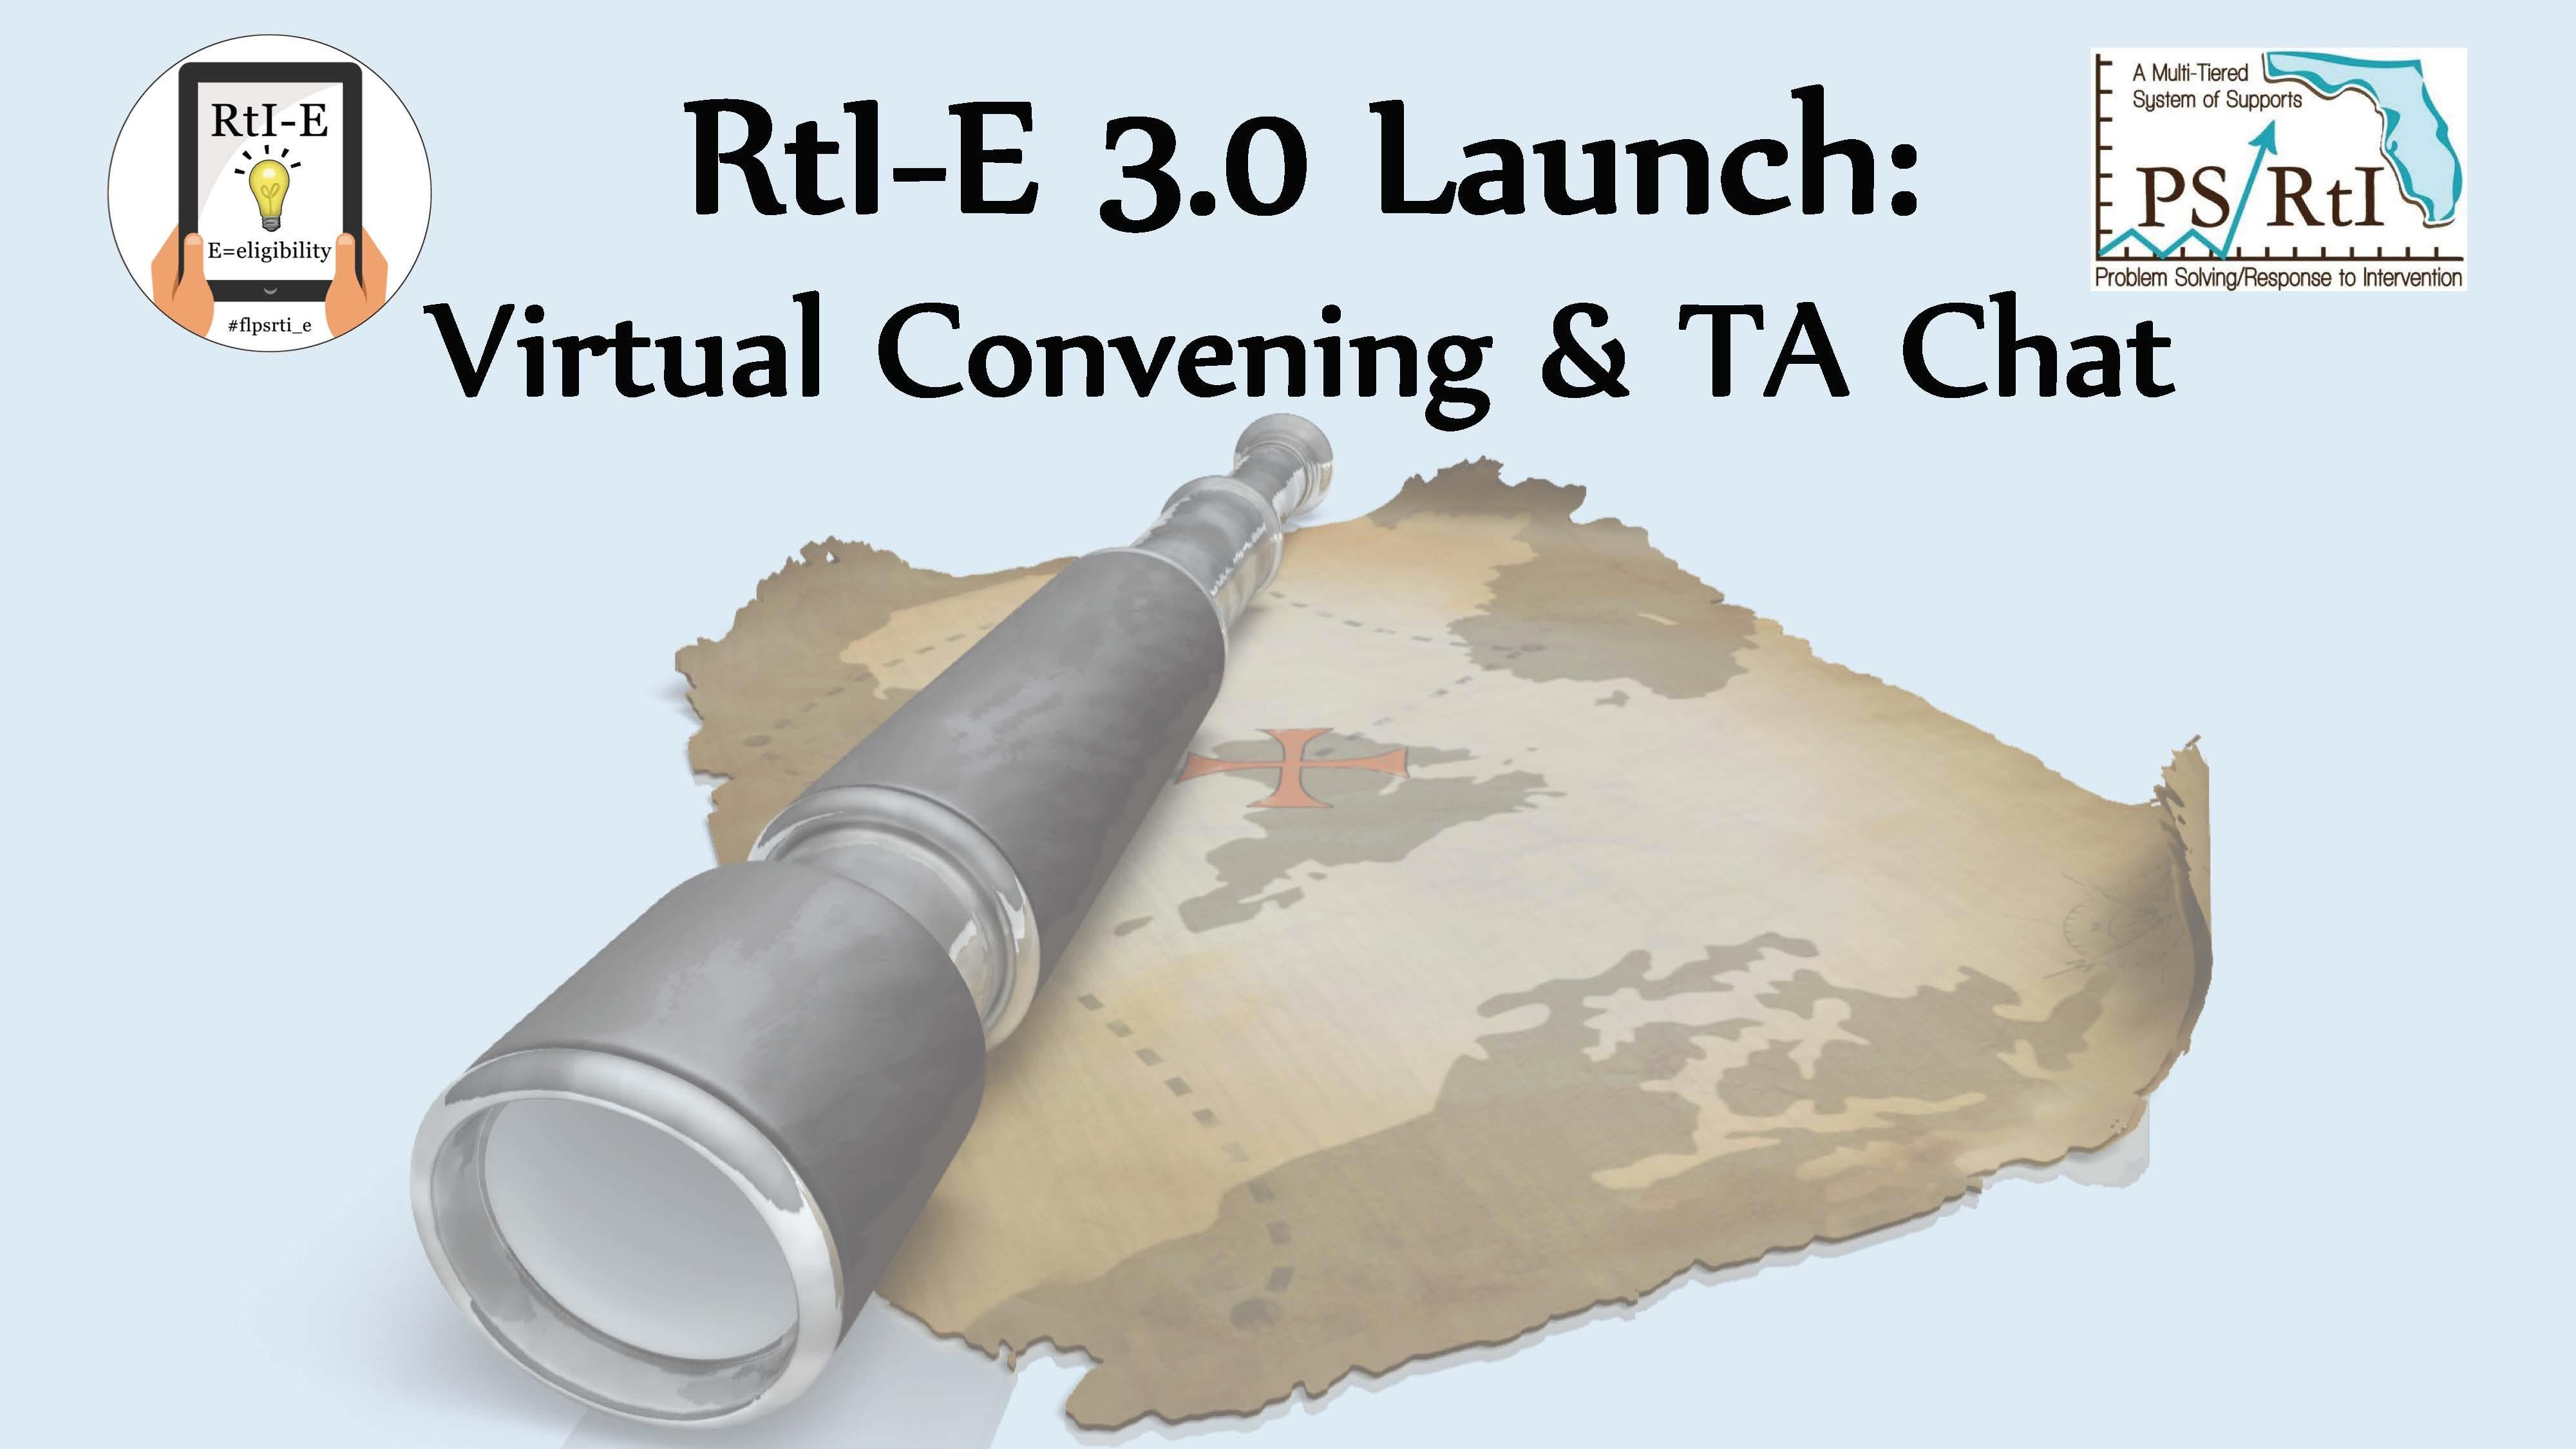 RtI-E 3.0 Launch - Virtual Convening & TA Chat